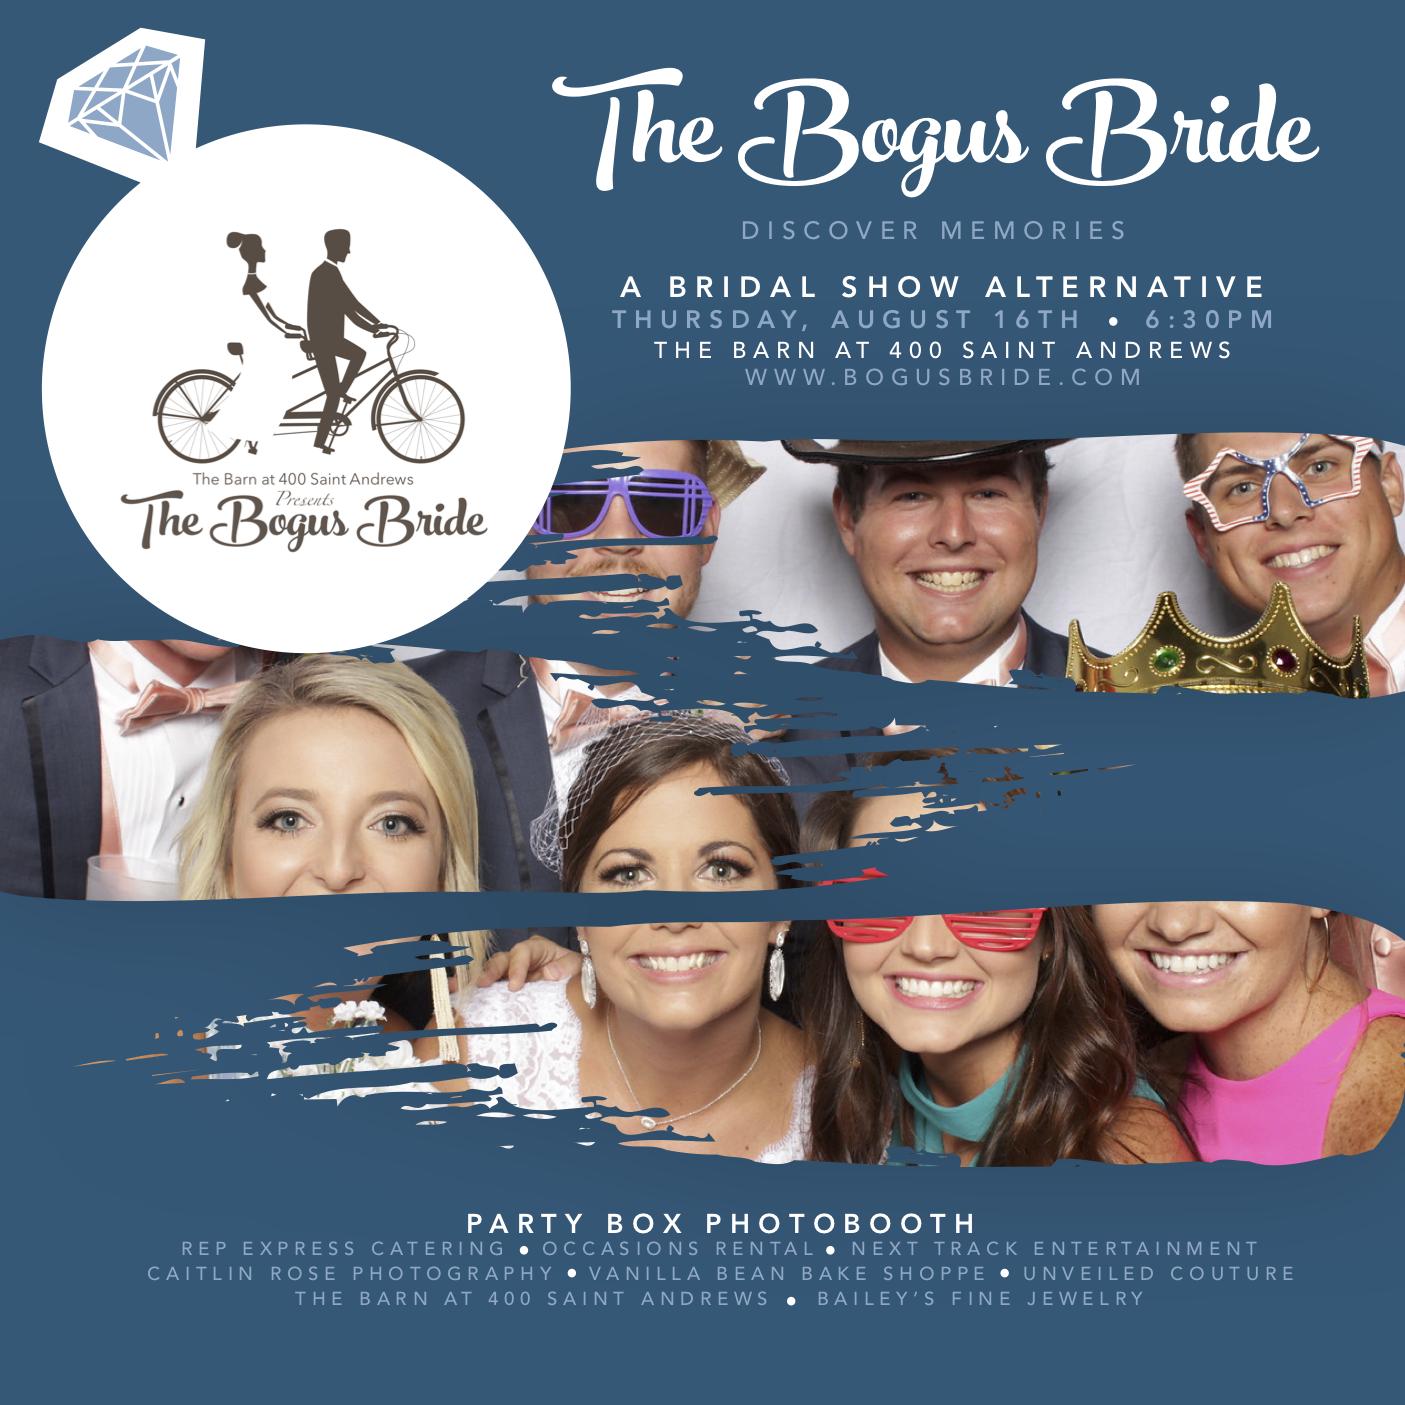 Bogus Bride Bridal Show August 16th